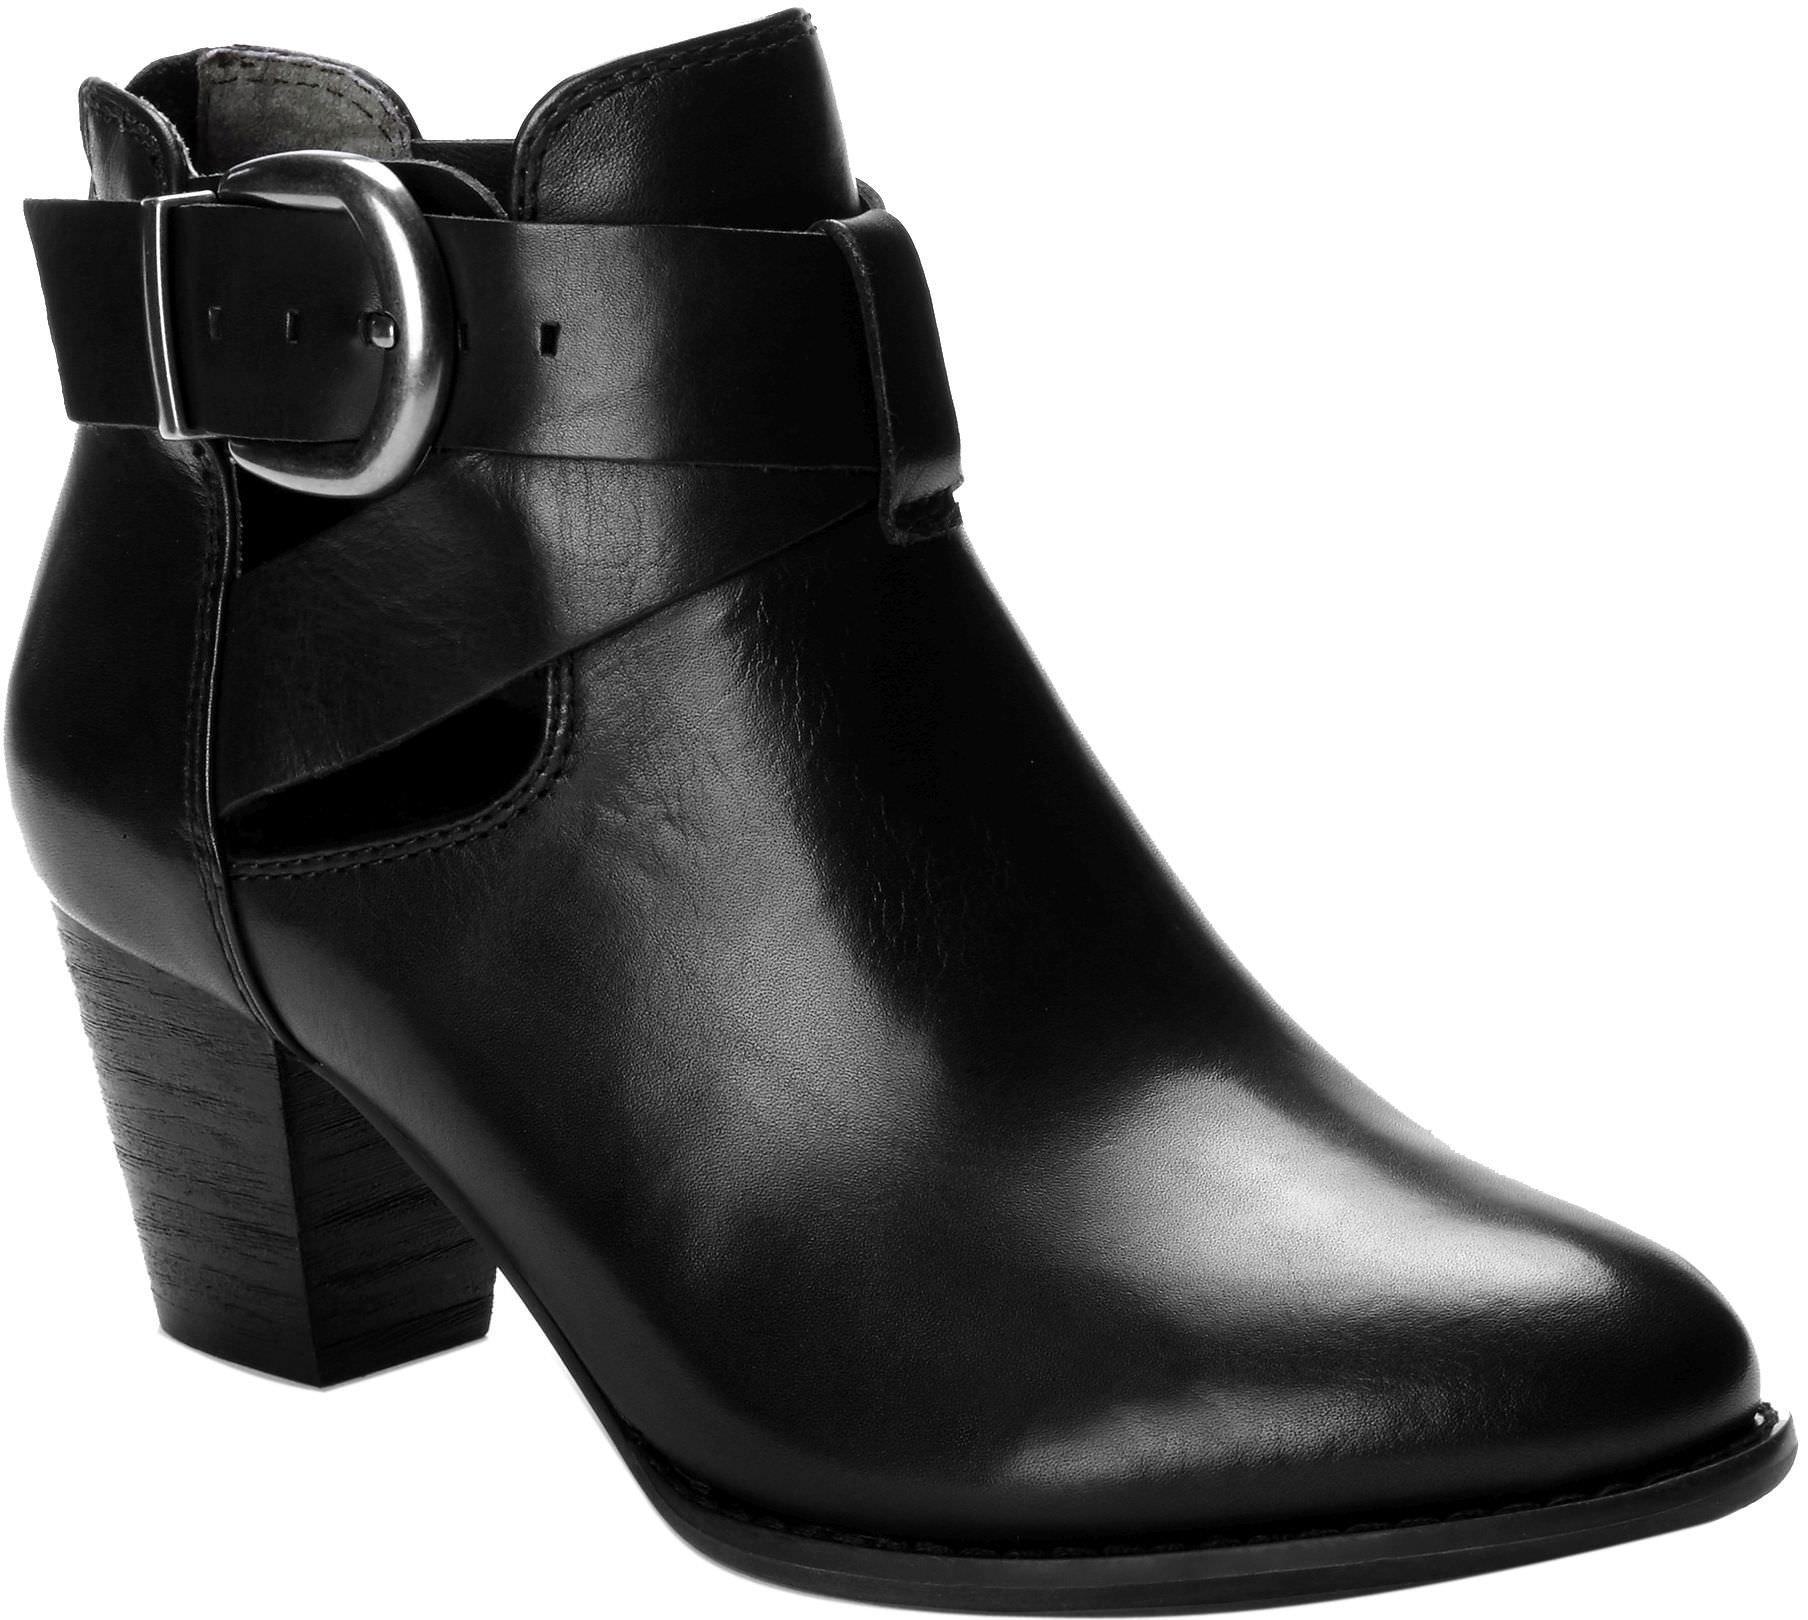 Vionic Upright Rory - Womens Heeled Boot Black - 9 Medium